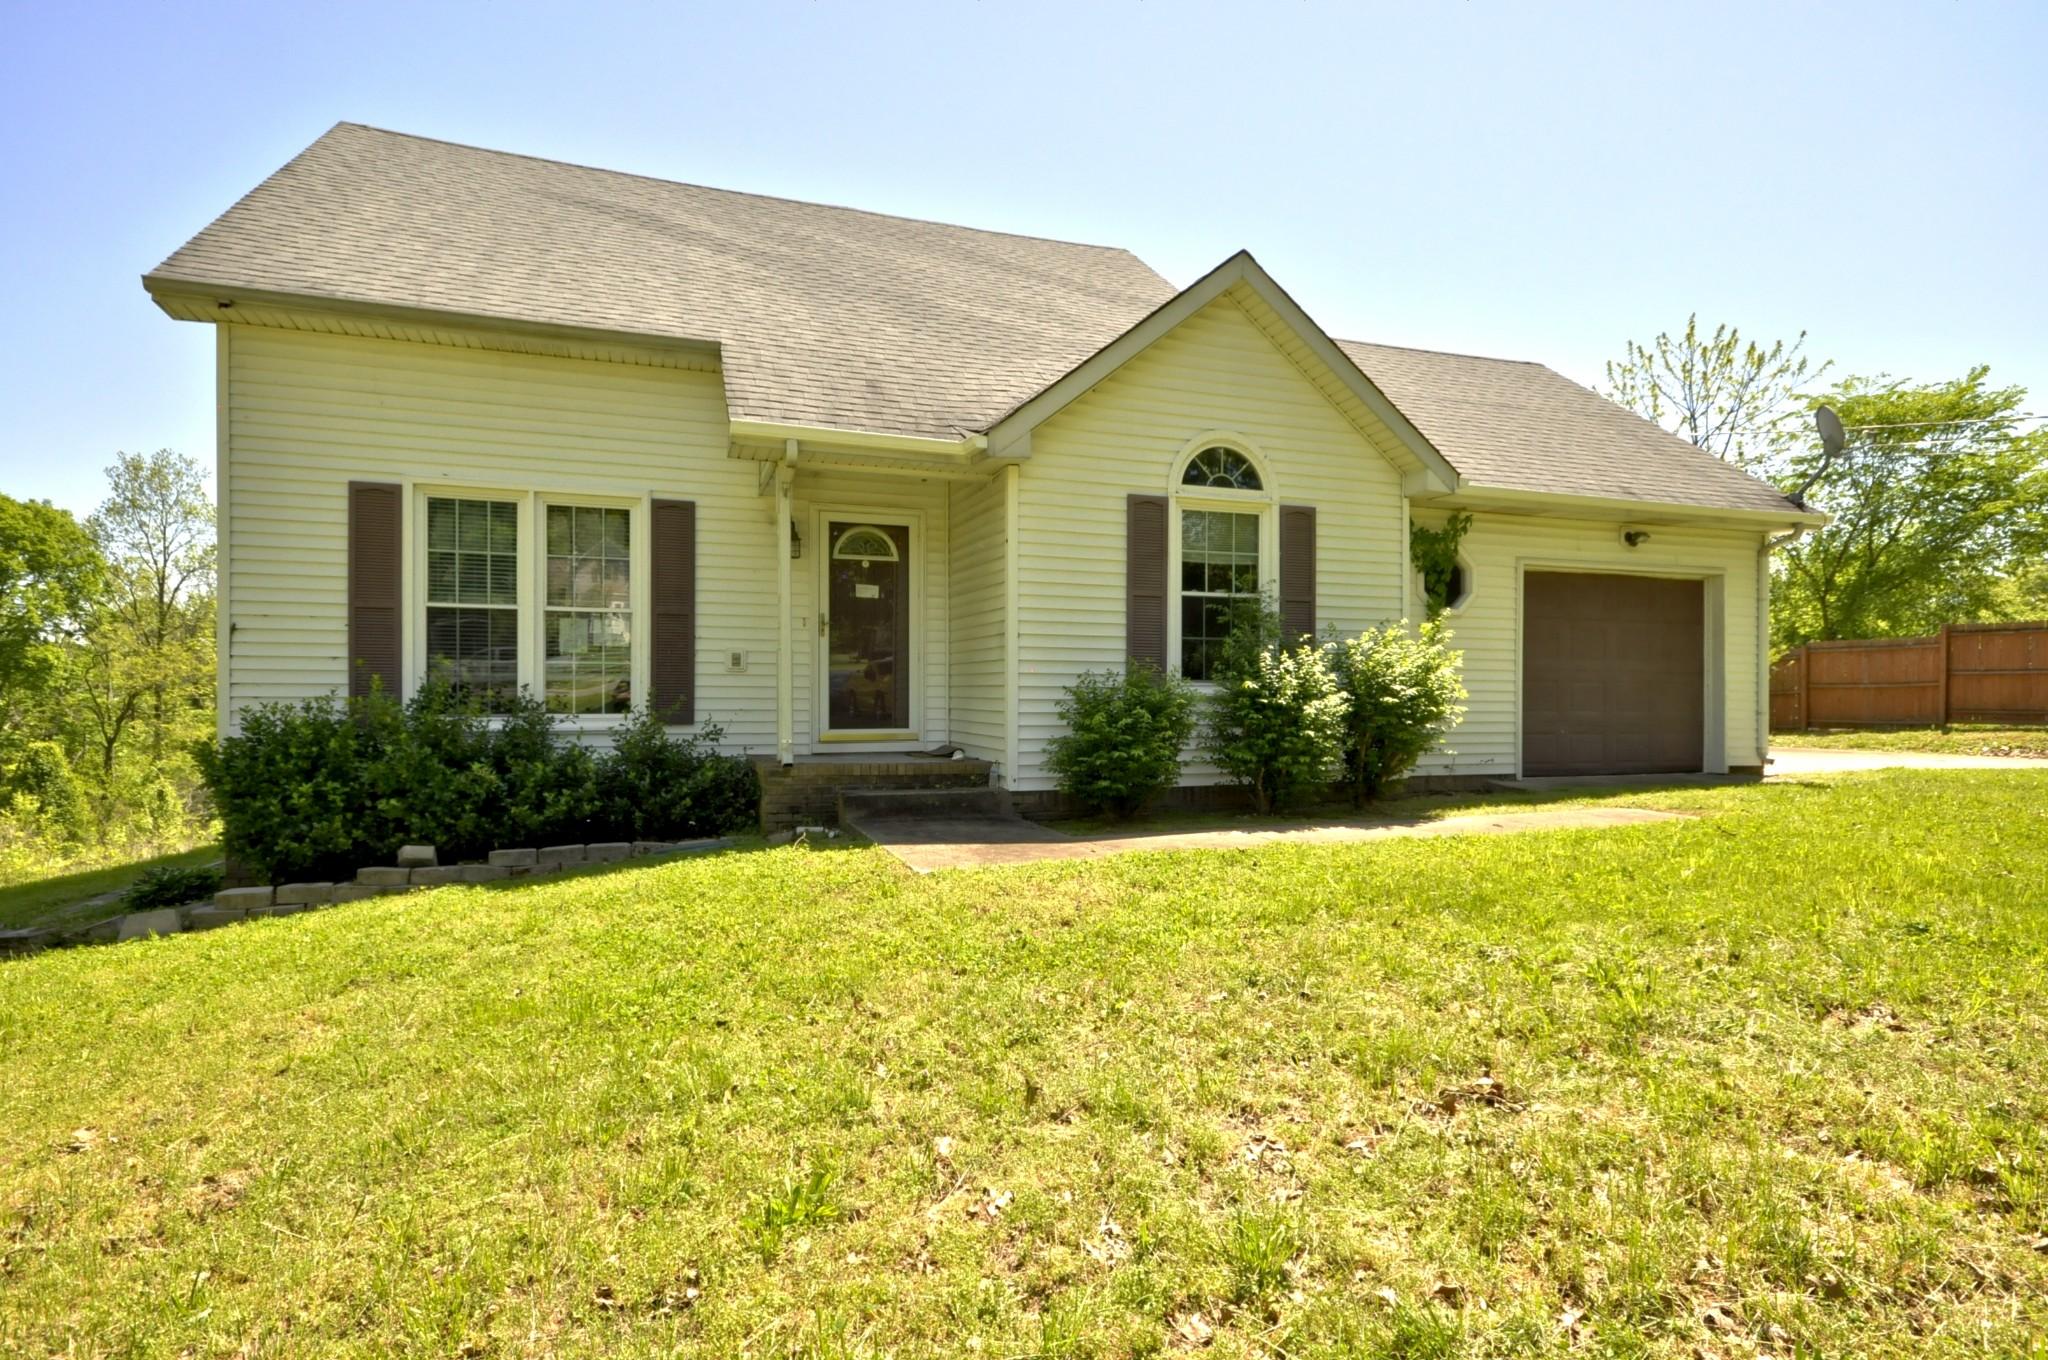 4041 SAWMILL RD Property Photo - Woodlawn, TN real estate listing